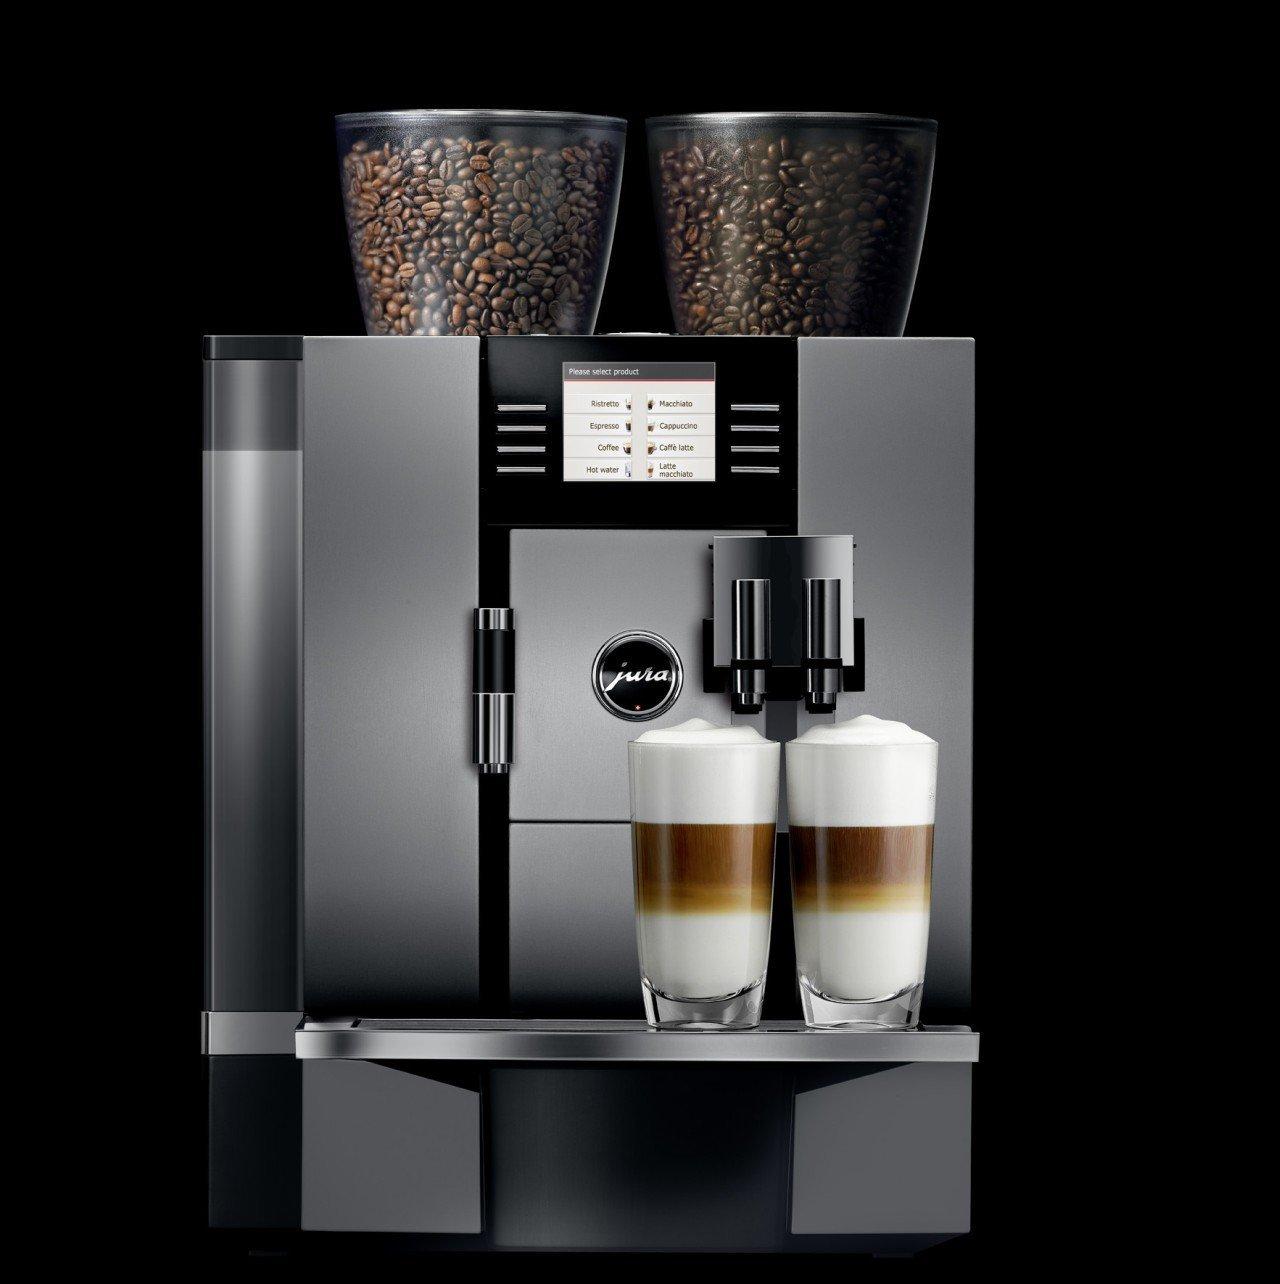 jura giga x9c professional kaffeevollautomat test. Black Bedroom Furniture Sets. Home Design Ideas